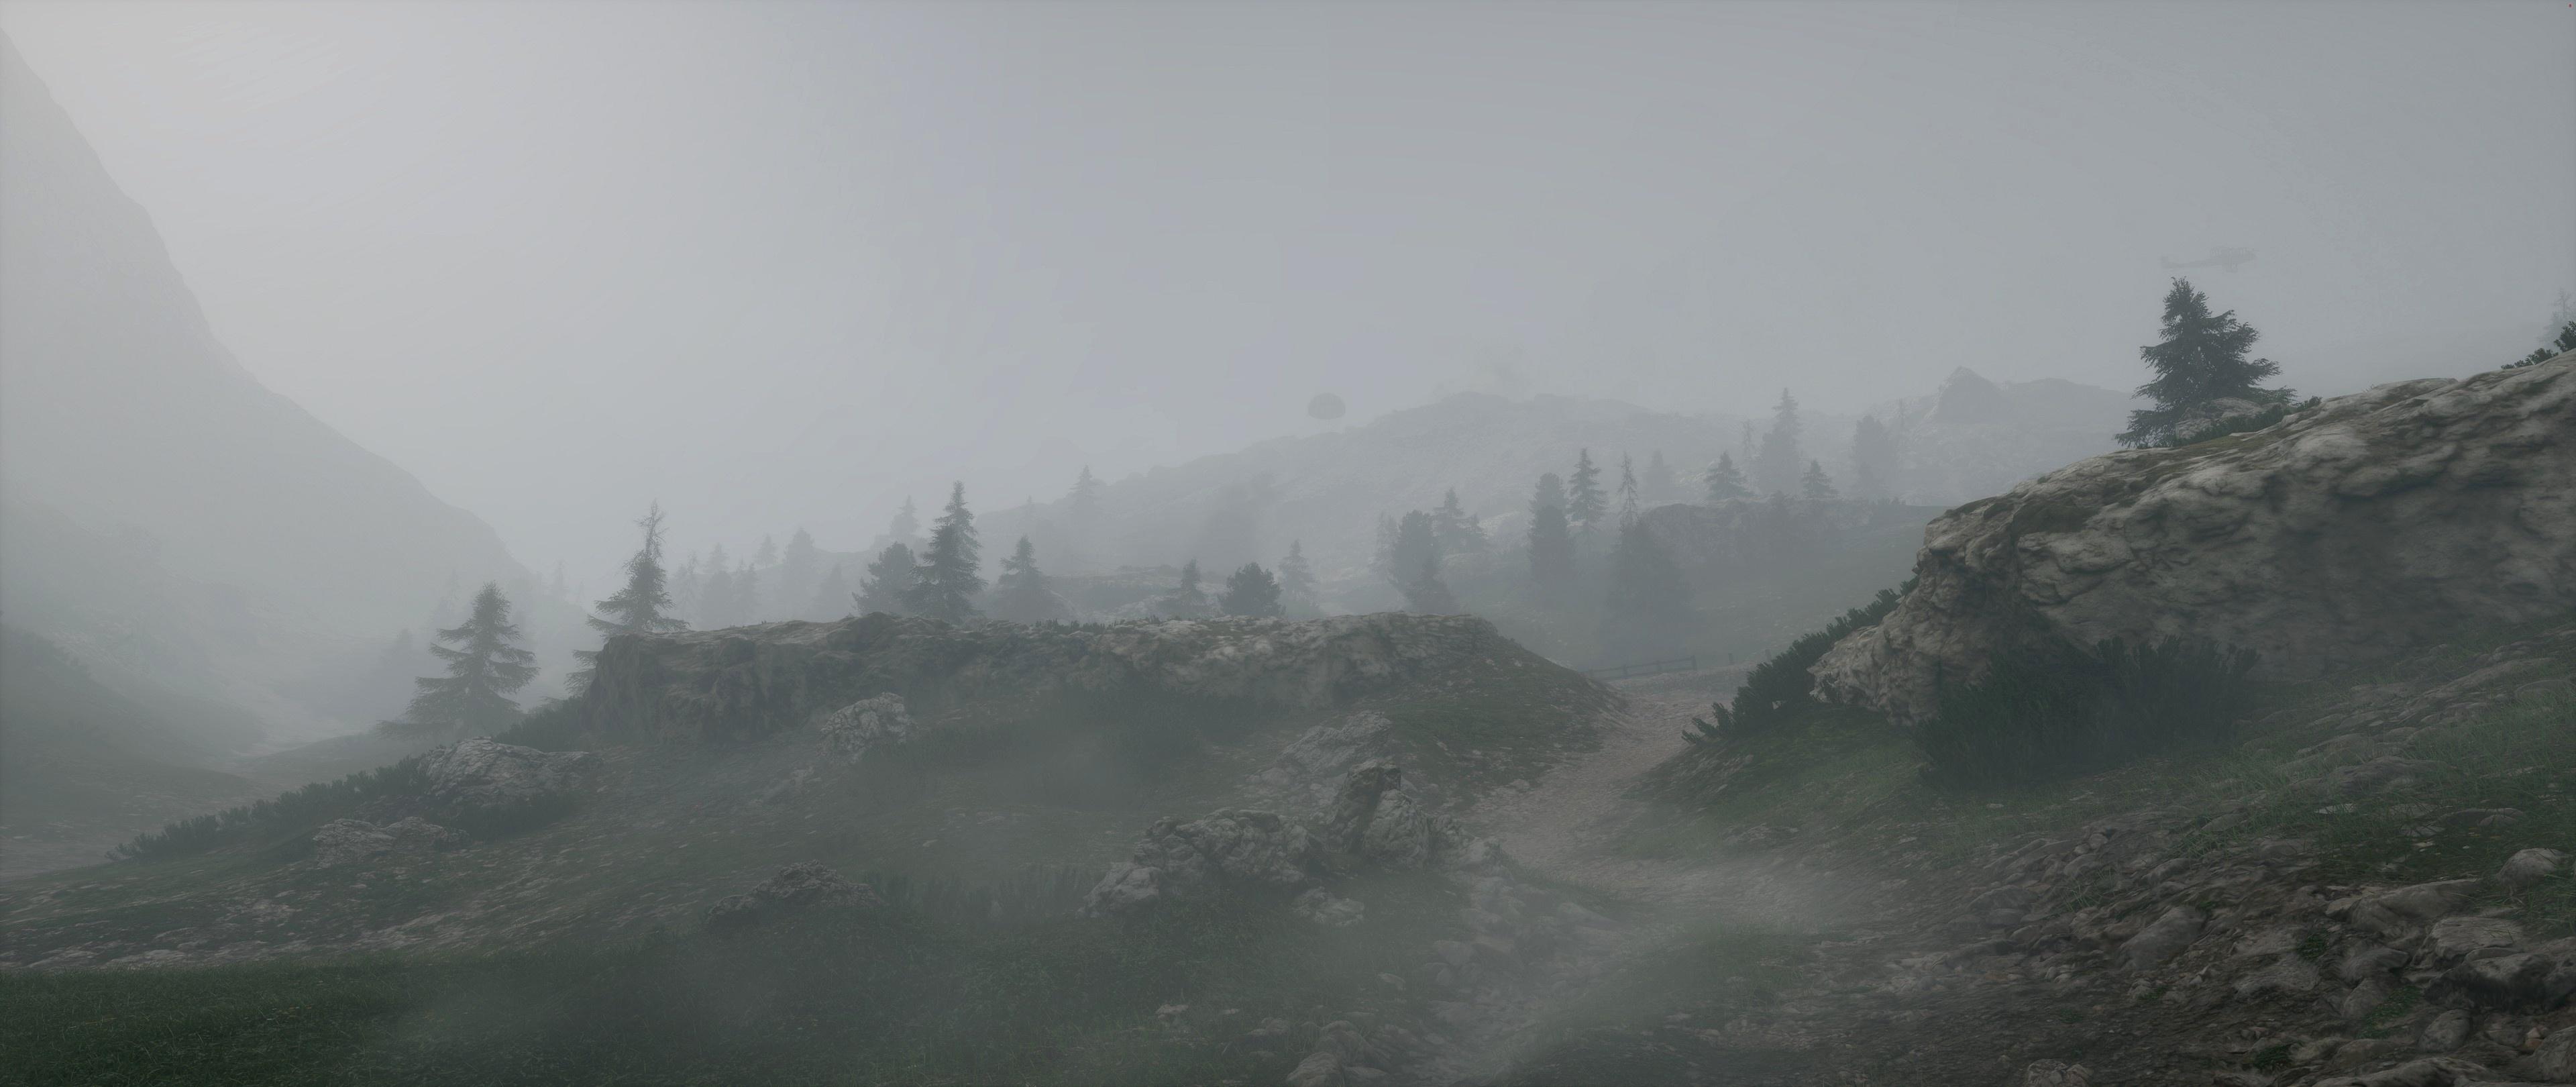 Battlefield 1 4К - Battlefield 1 4К